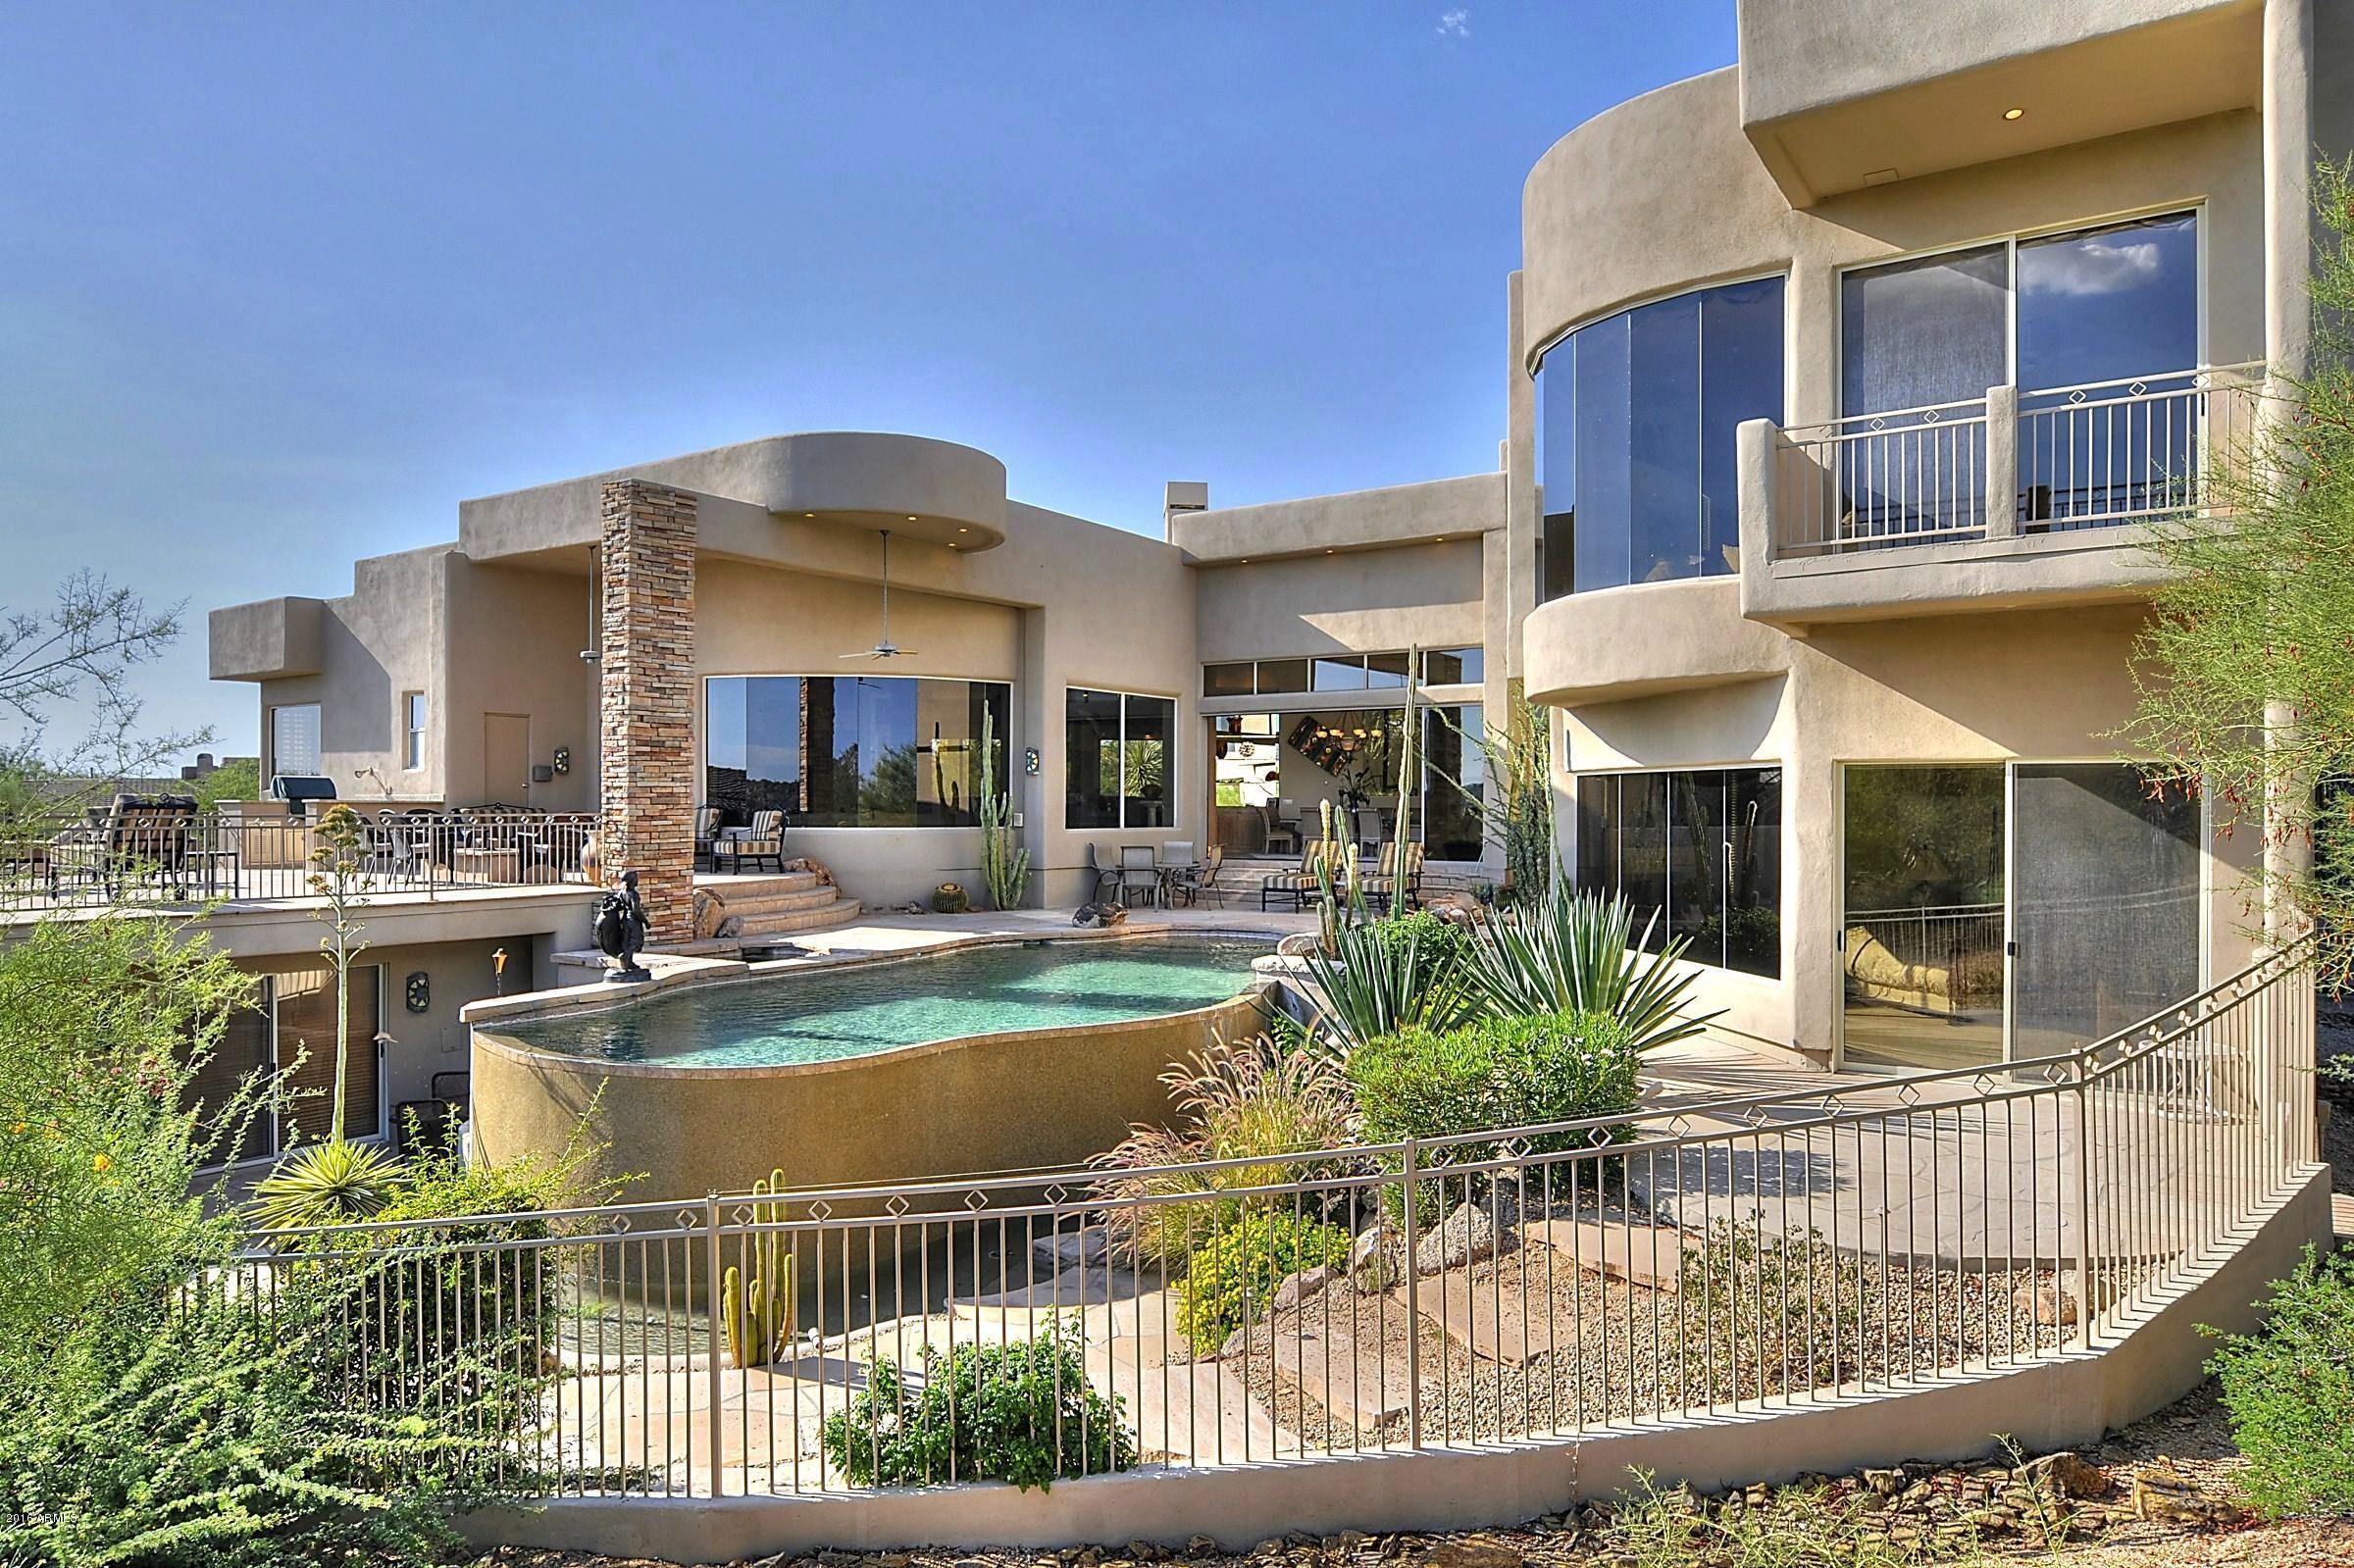 10589 E SKINNER Drive Scottsdale, AZ 85262 - MLS #: 5571580